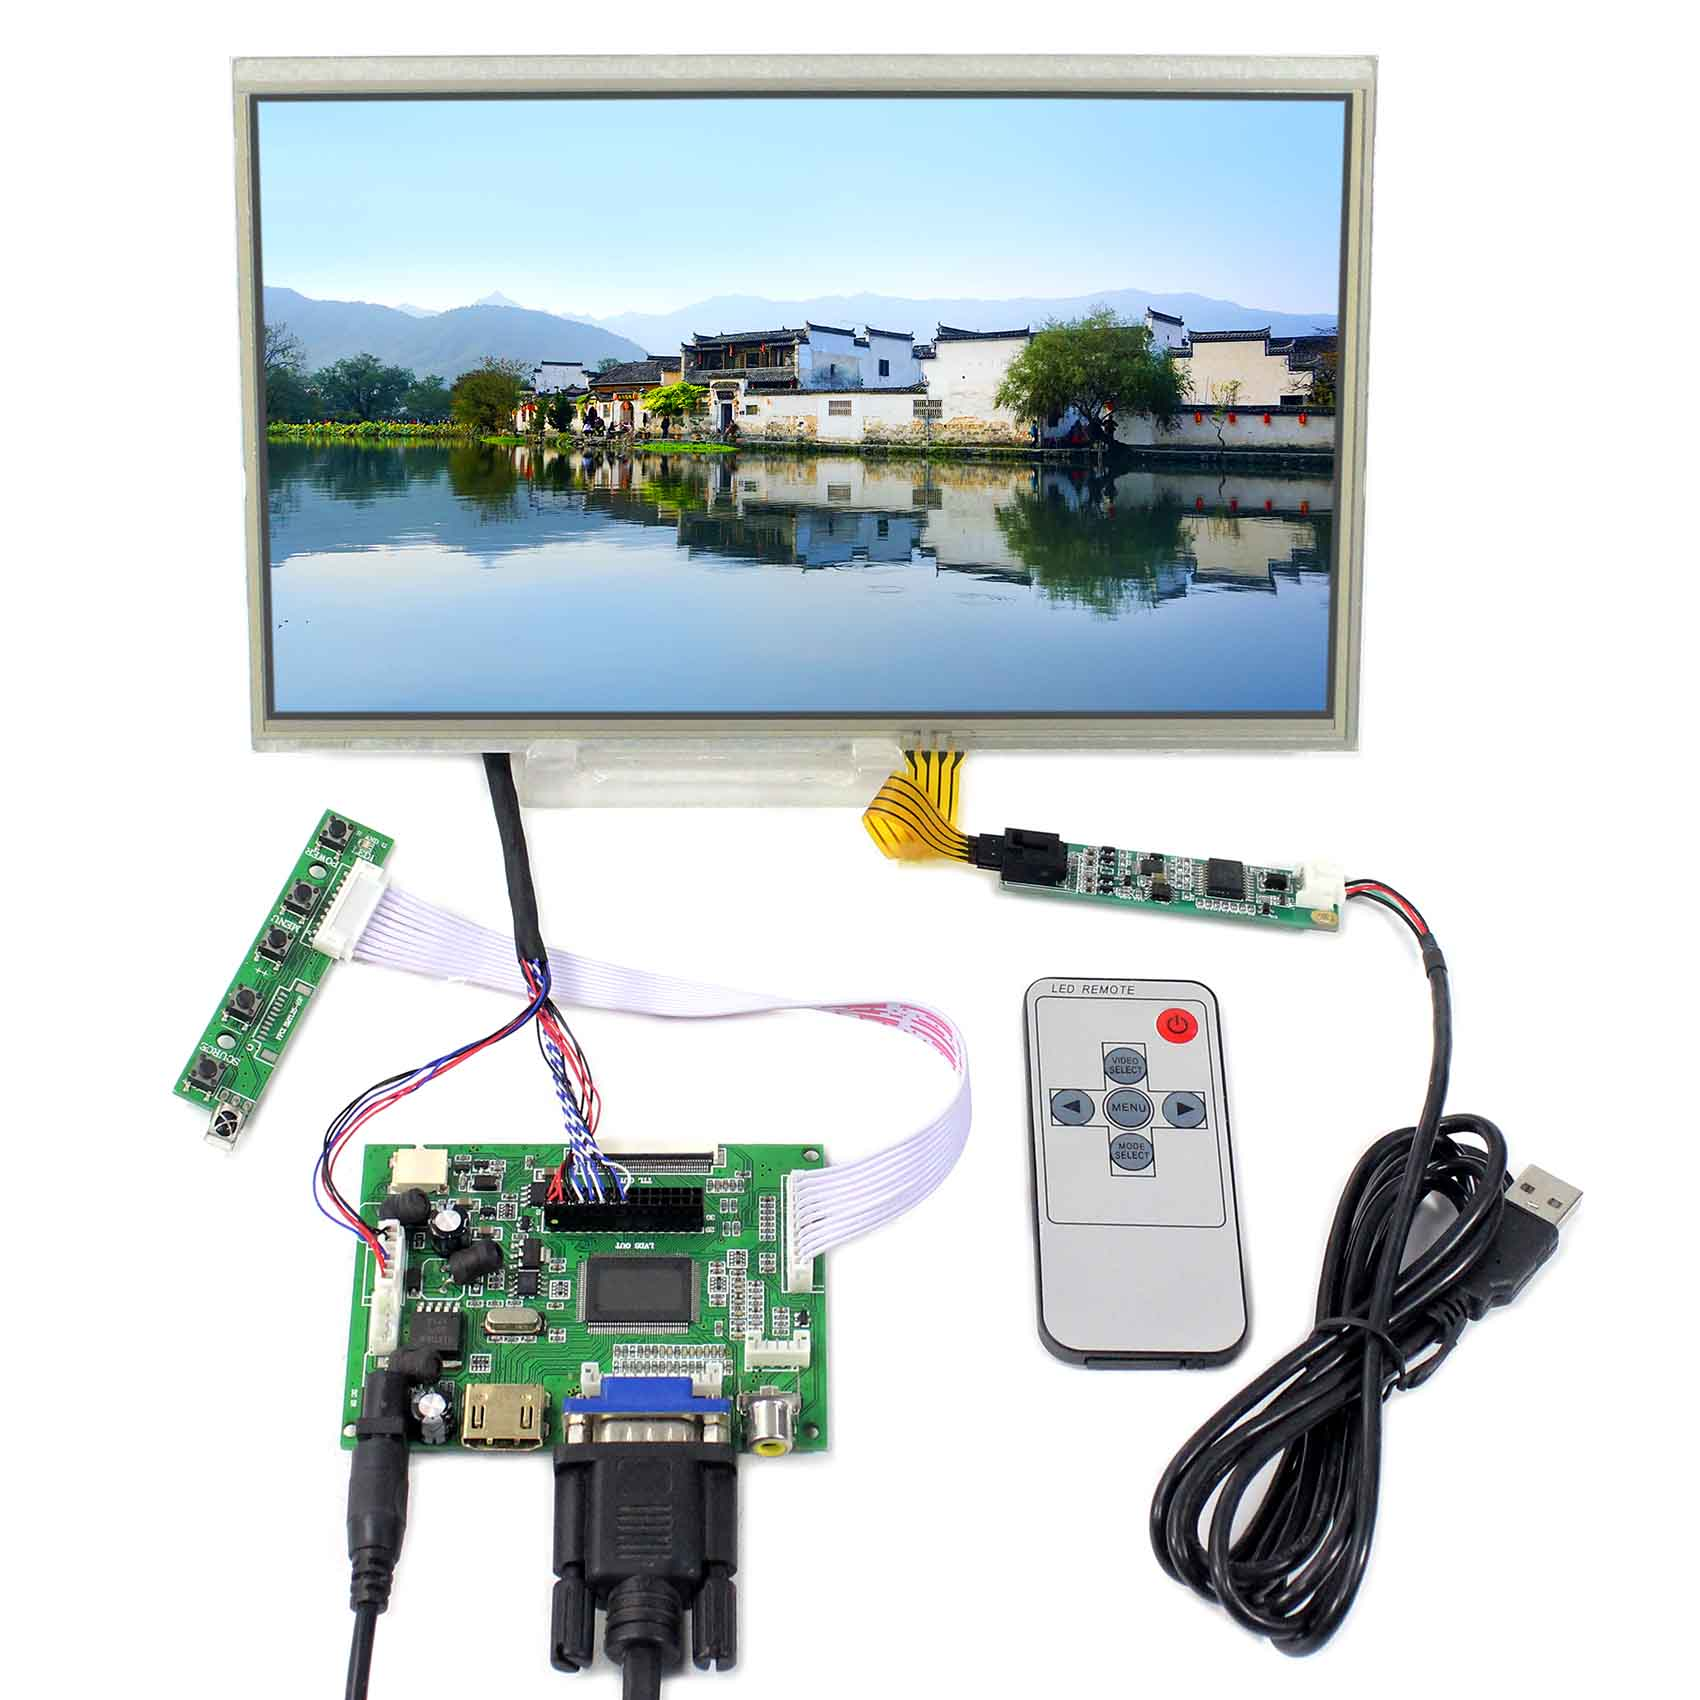 10.1 Tocuh Display LCD 1024x600 LTN101NT02 B101AW03 N101L6 HDMI DVI VGA Consiglio LCD 10.1 Schermo LCD10.1 Tocuh Display LCD 1024x600 LTN101NT02 B101AW03 N101L6 HDMI DVI VGA Consiglio LCD 10.1 Schermo LCD